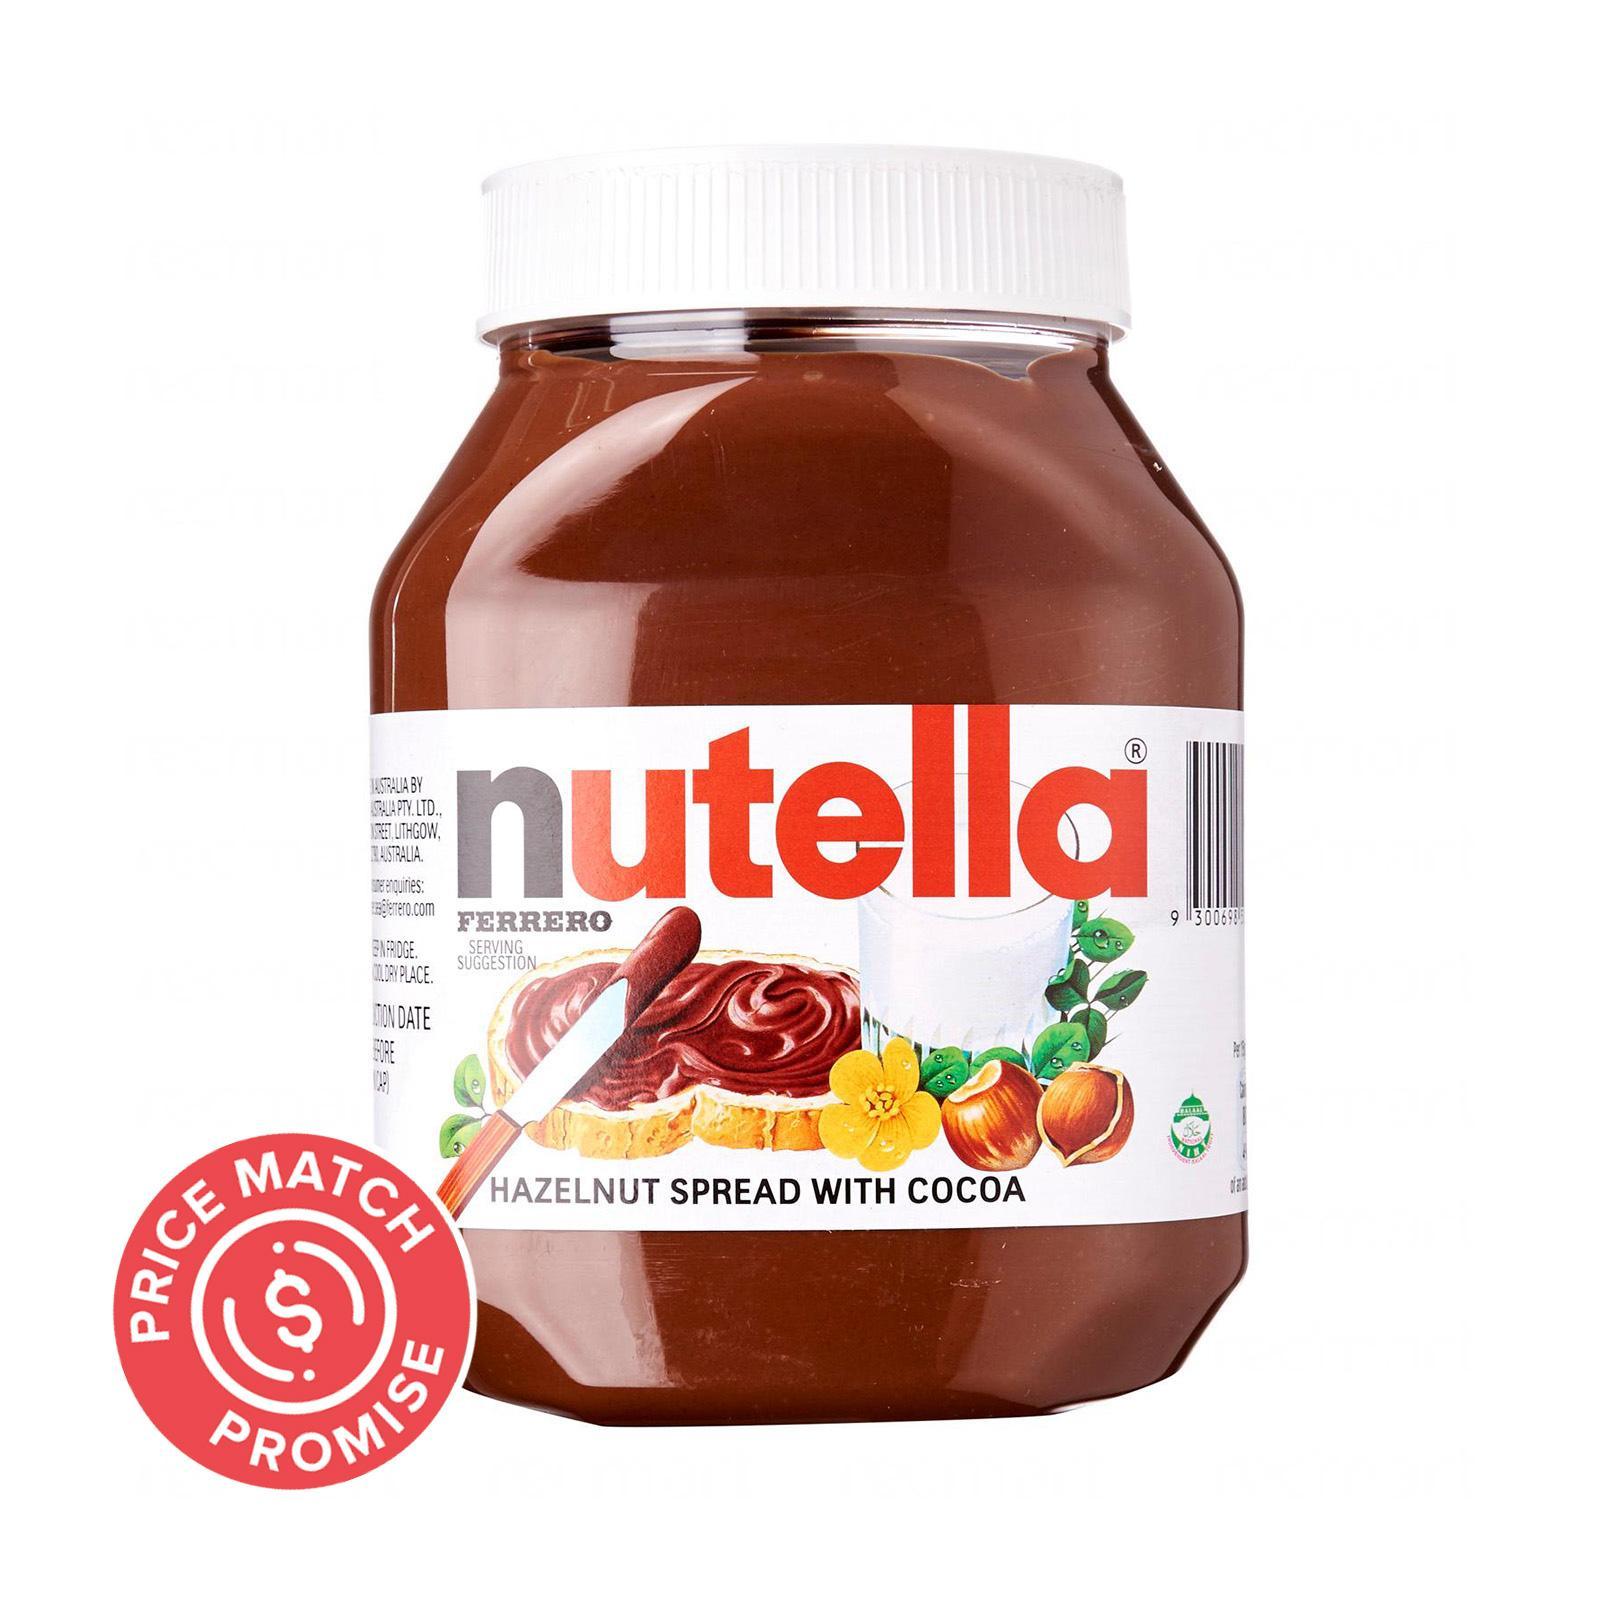 NUTELLA Hazelnut Spread 900g